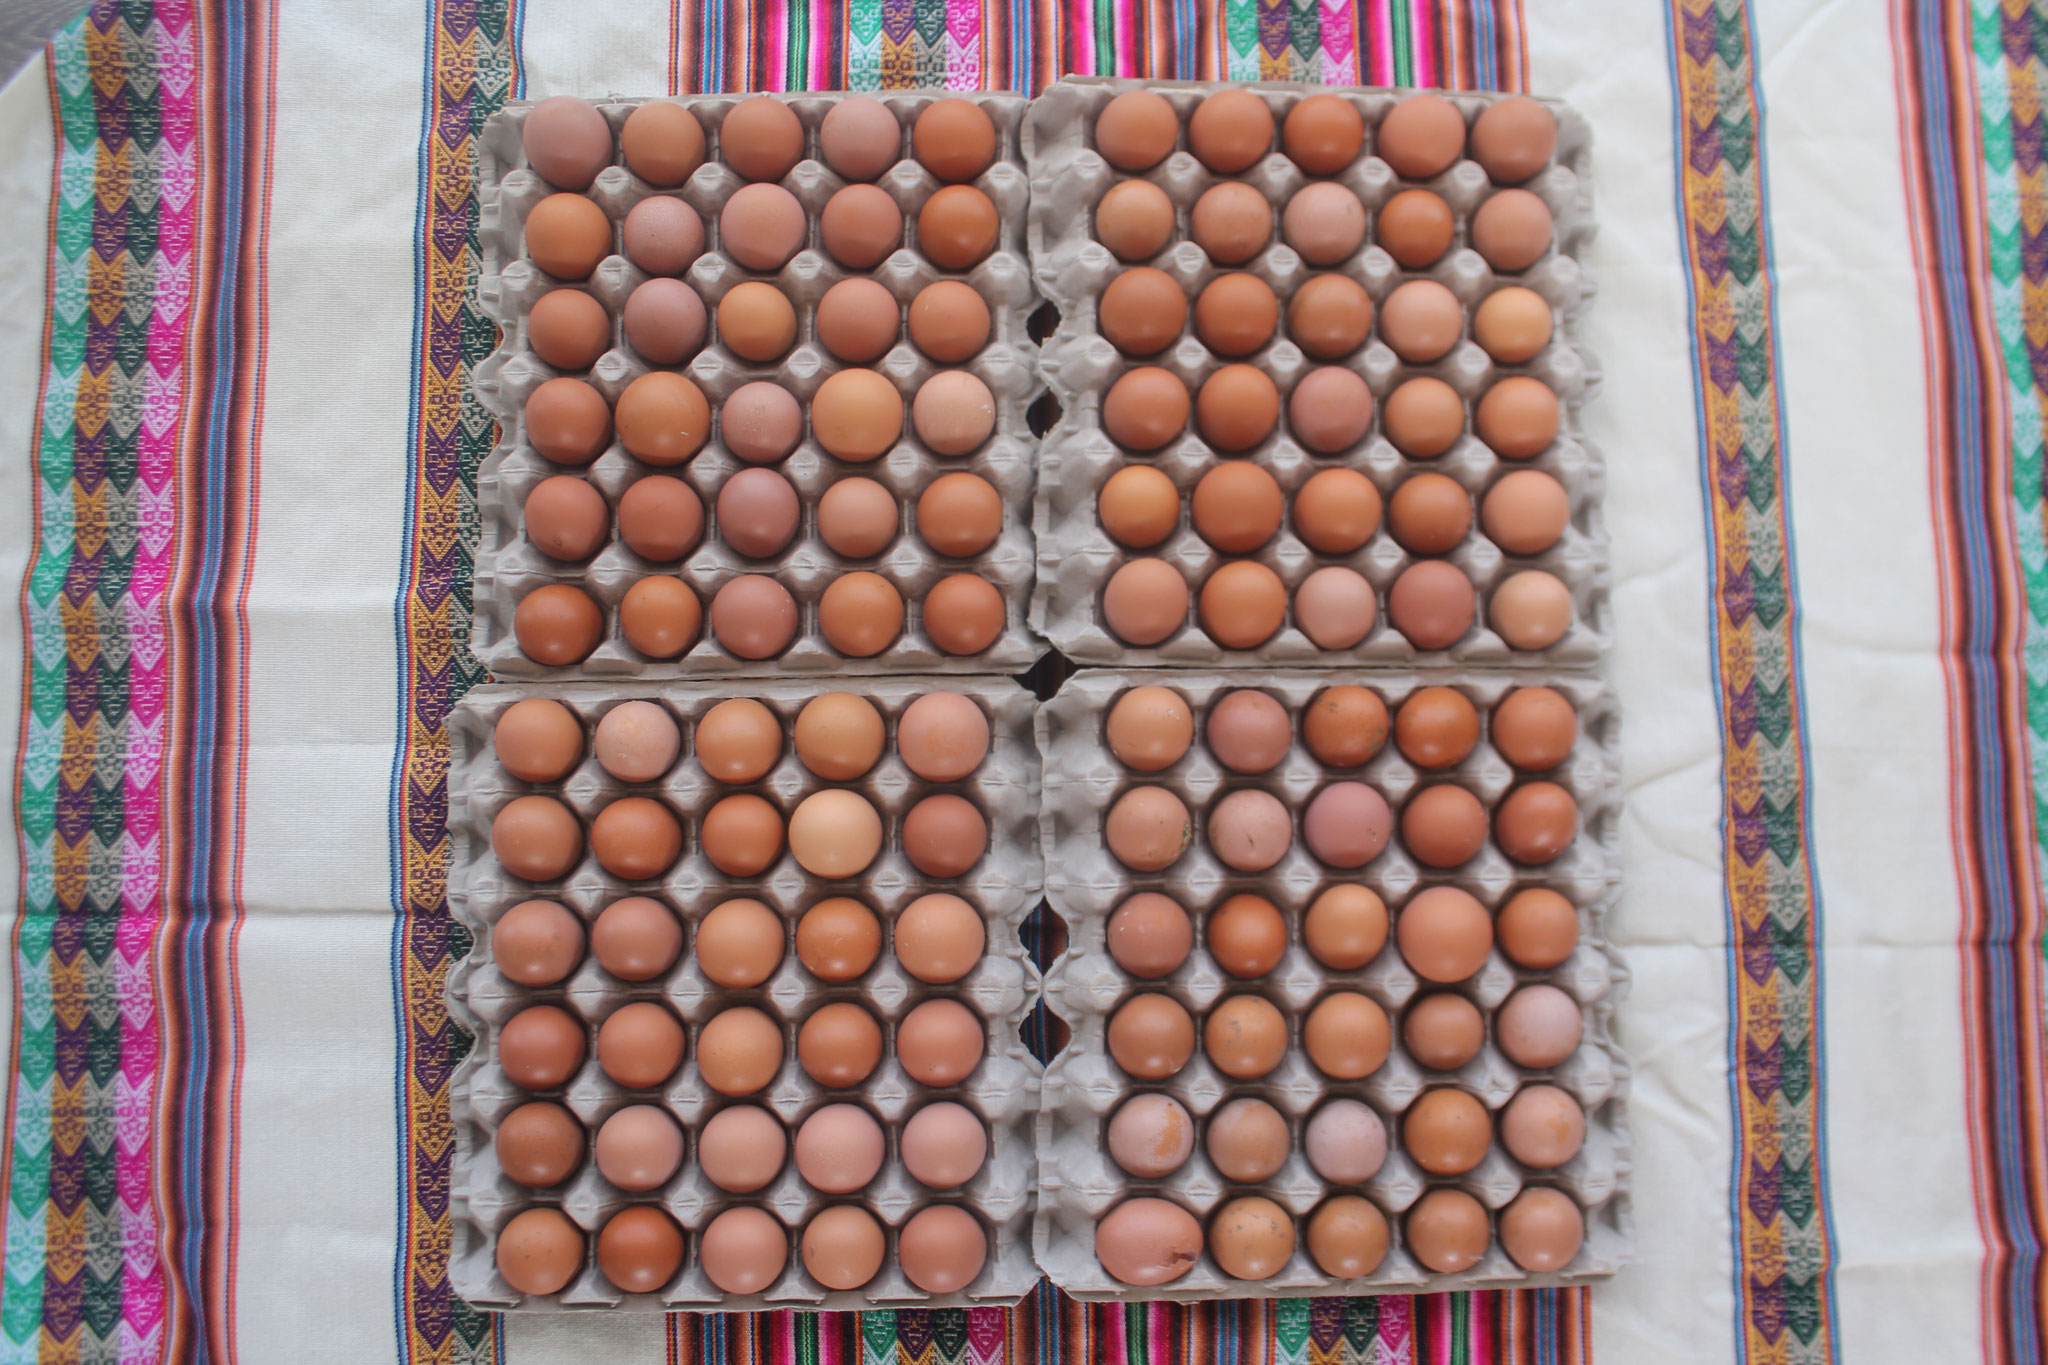 Huevos Alta Calidad